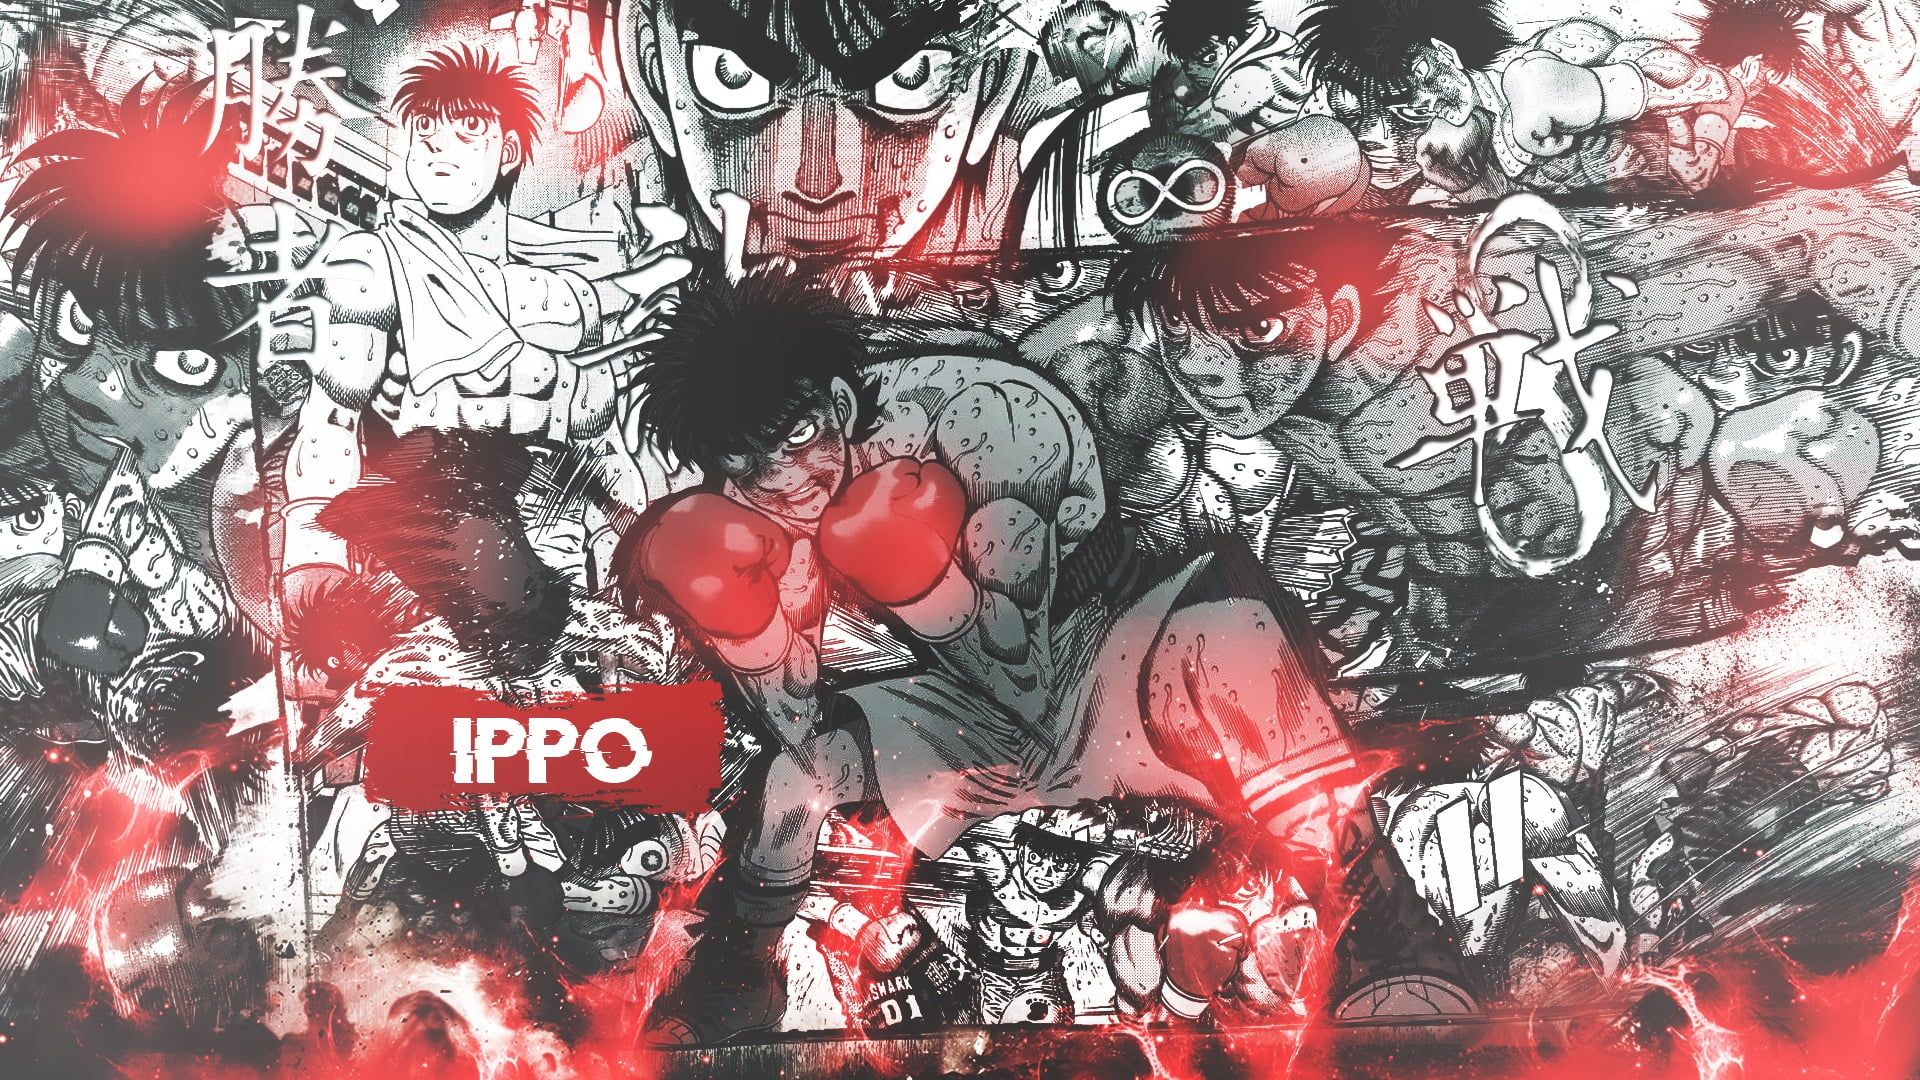 Anime Hajime No Ippo Makunouchi Ippo 1080p Wallpaper Hdwallpaper Desktop Wallpaper Hd Wallpaper Anime